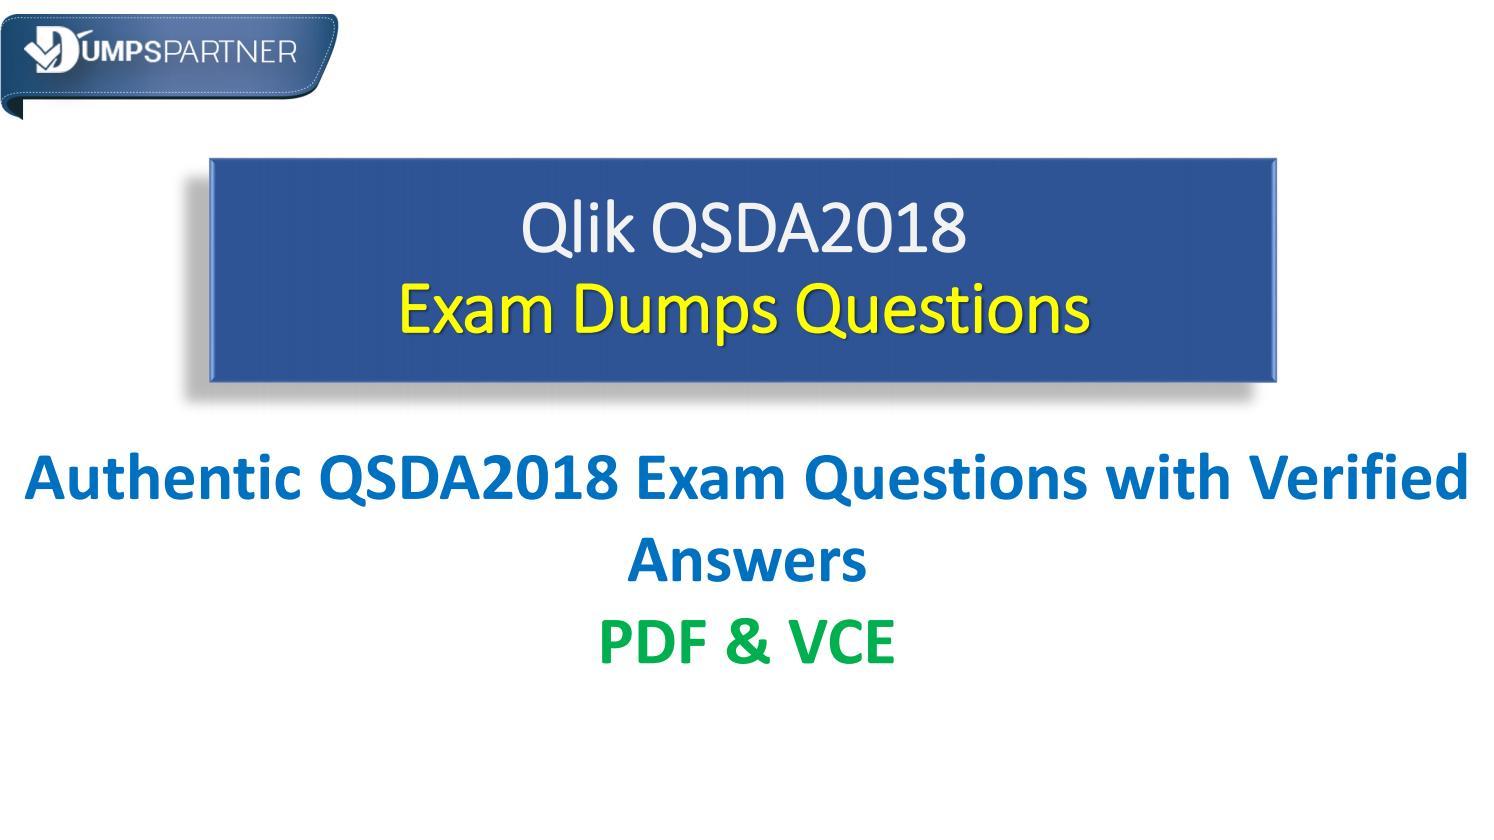 Real QSDA2018 Cheat Sheet Questions for Guaranteed Success